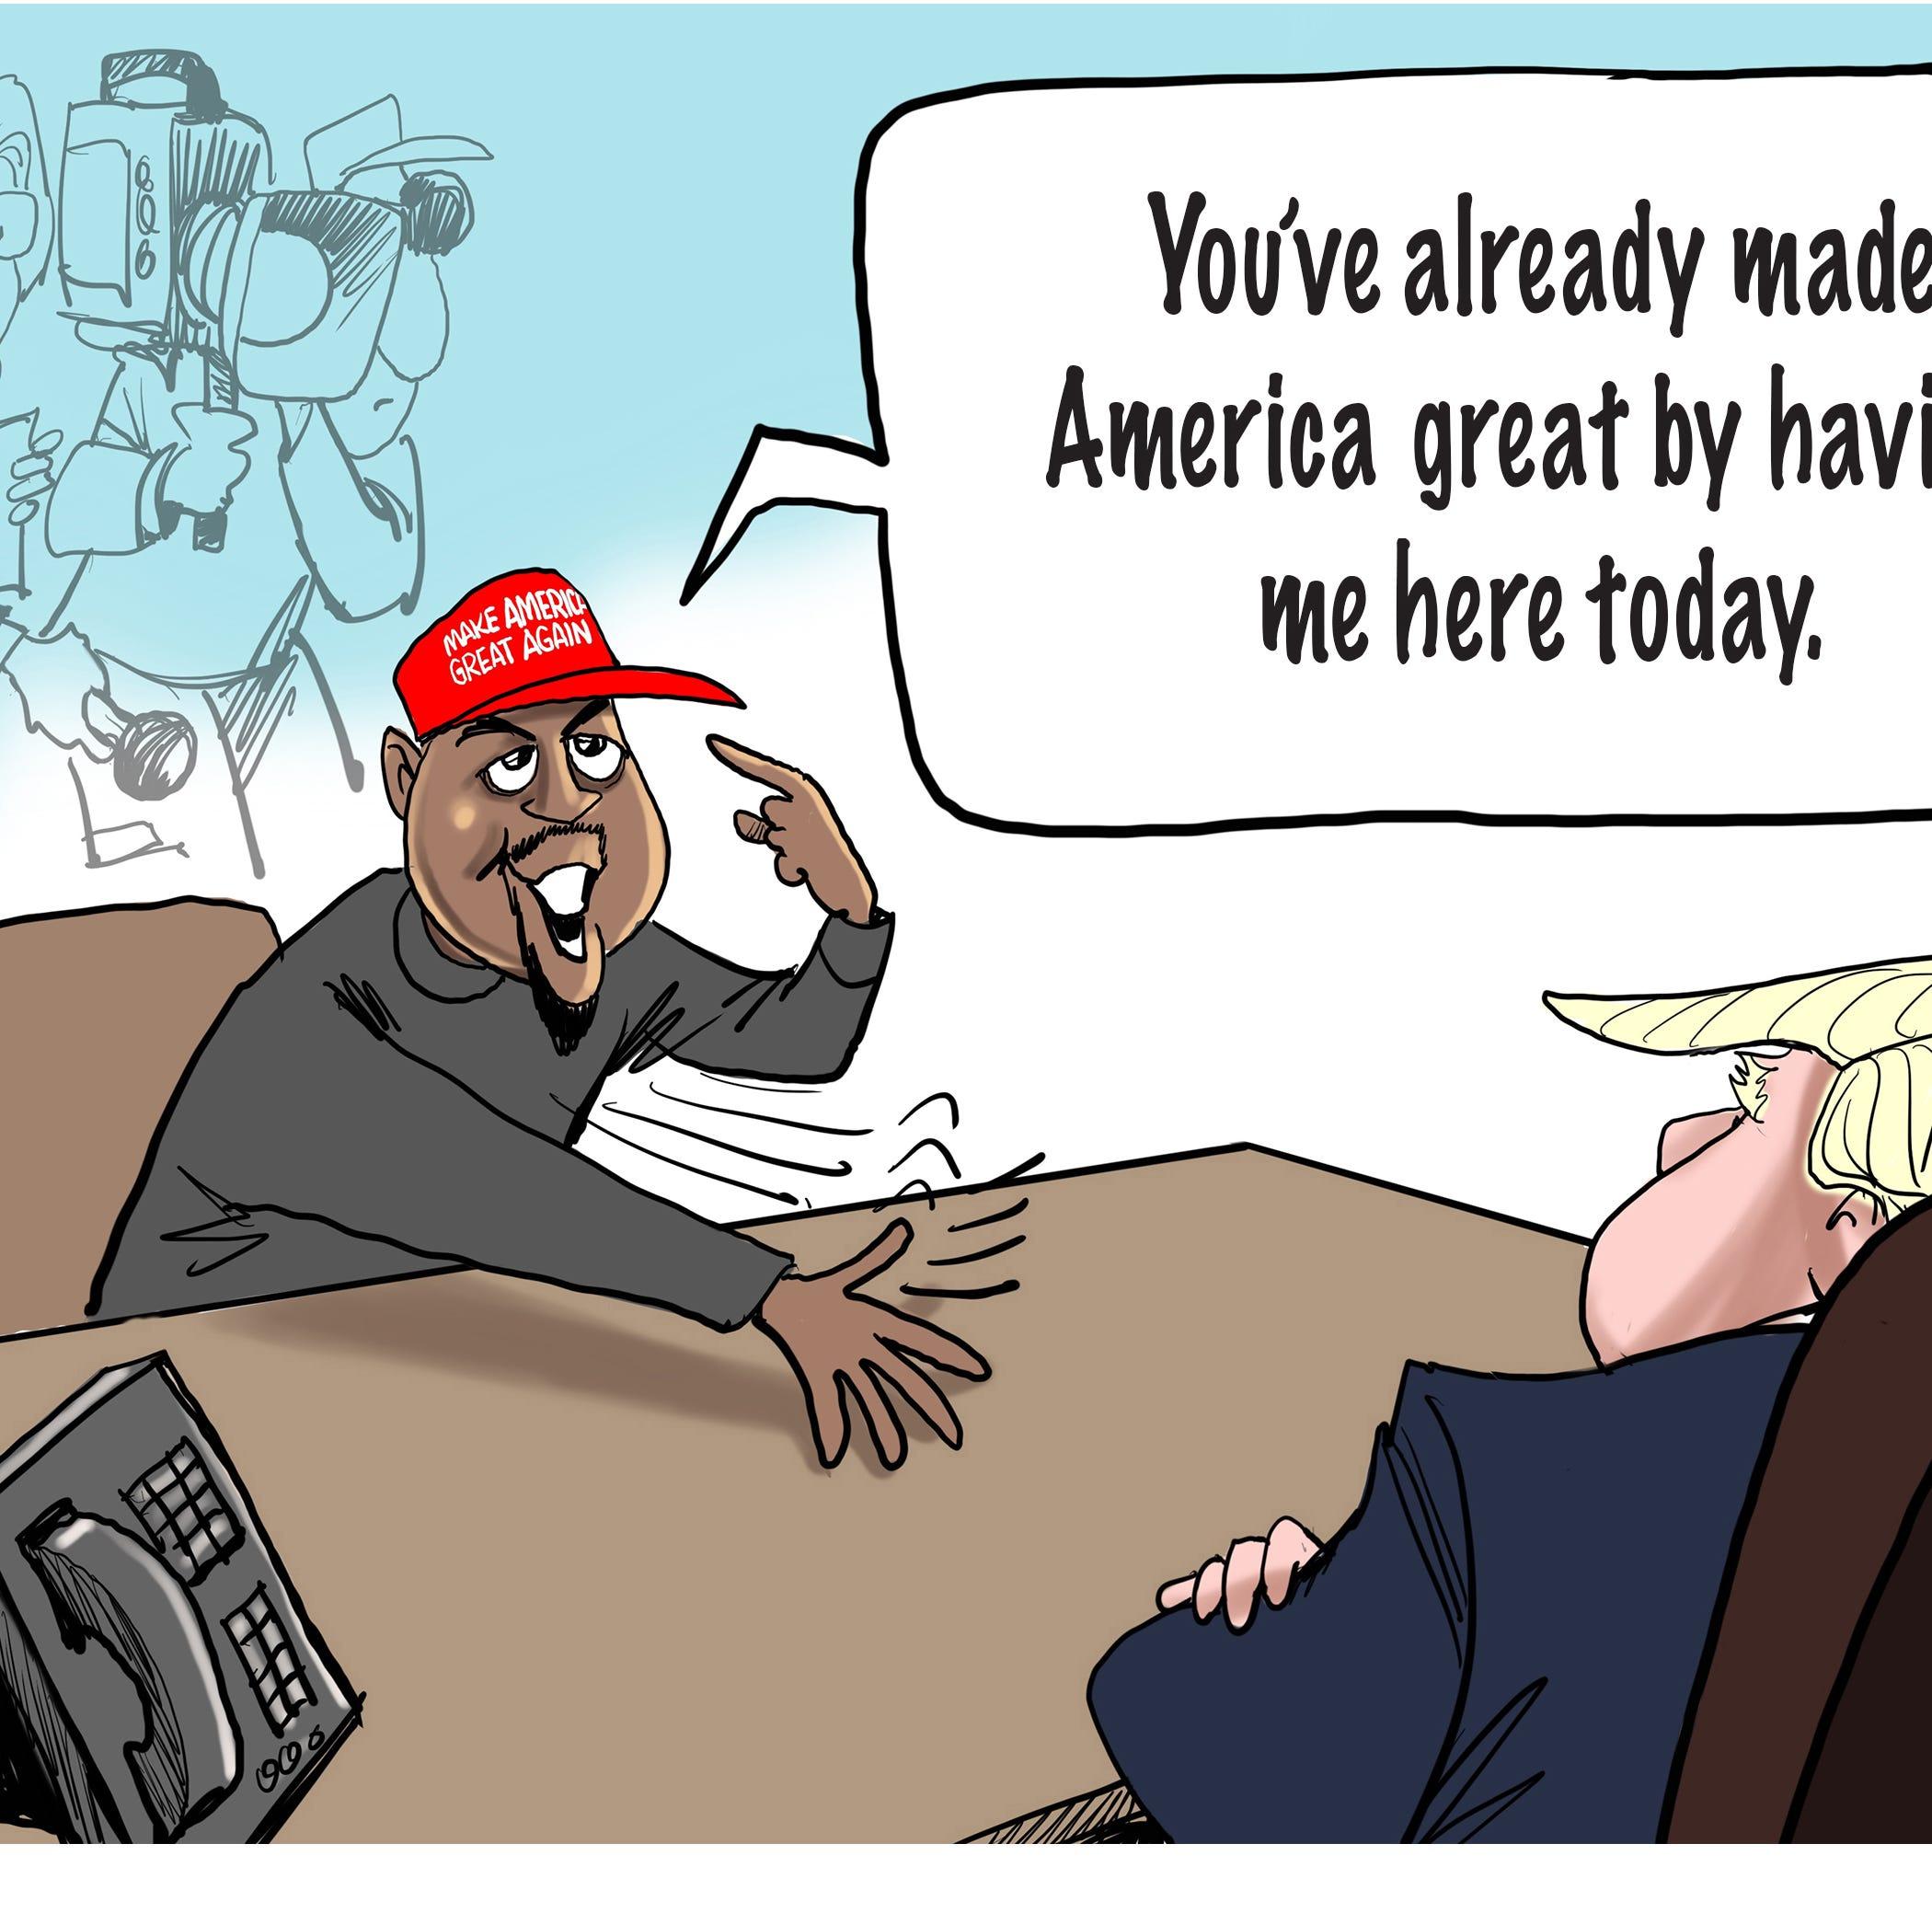 Cartoonist Gary Varvel: Caption this cartoon winners